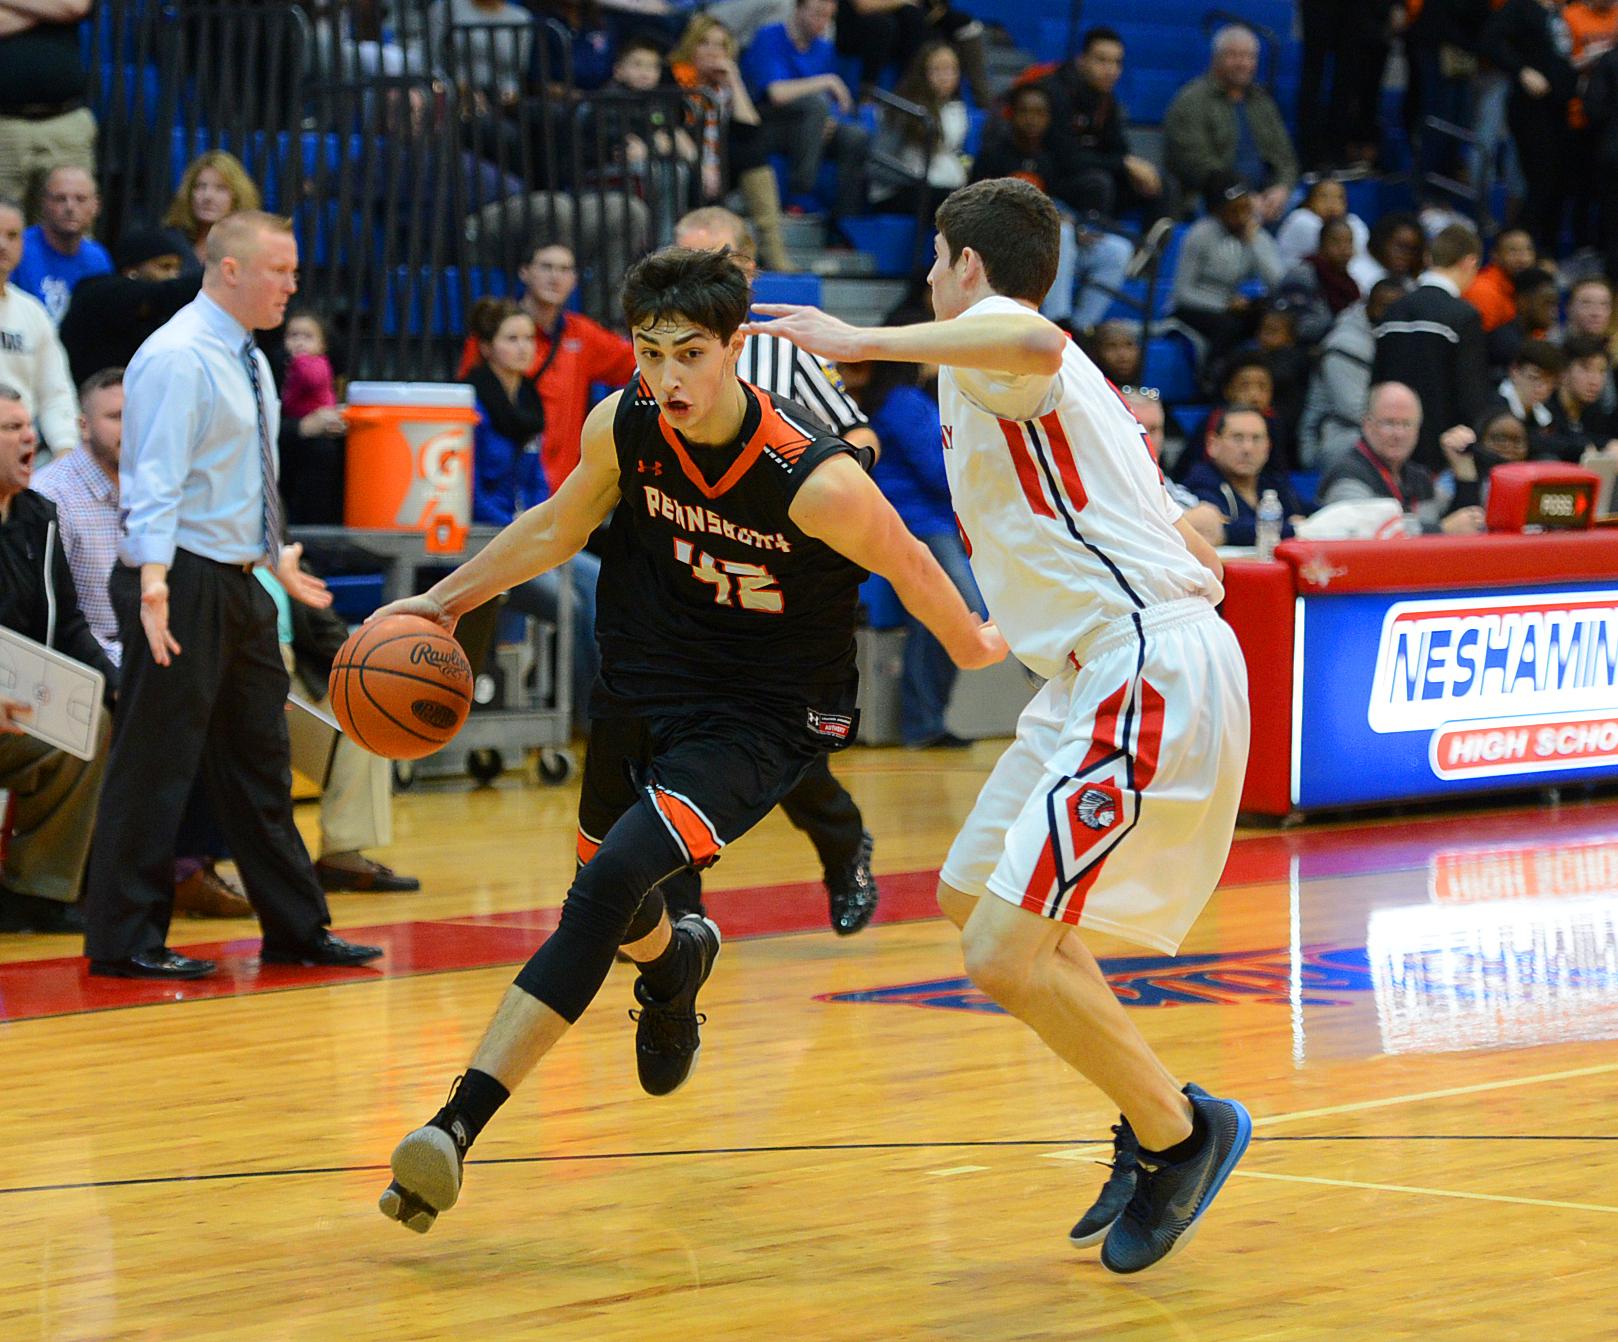 Pennsbury Basketballs Mark Flagg Commits To Saint Francis Boys